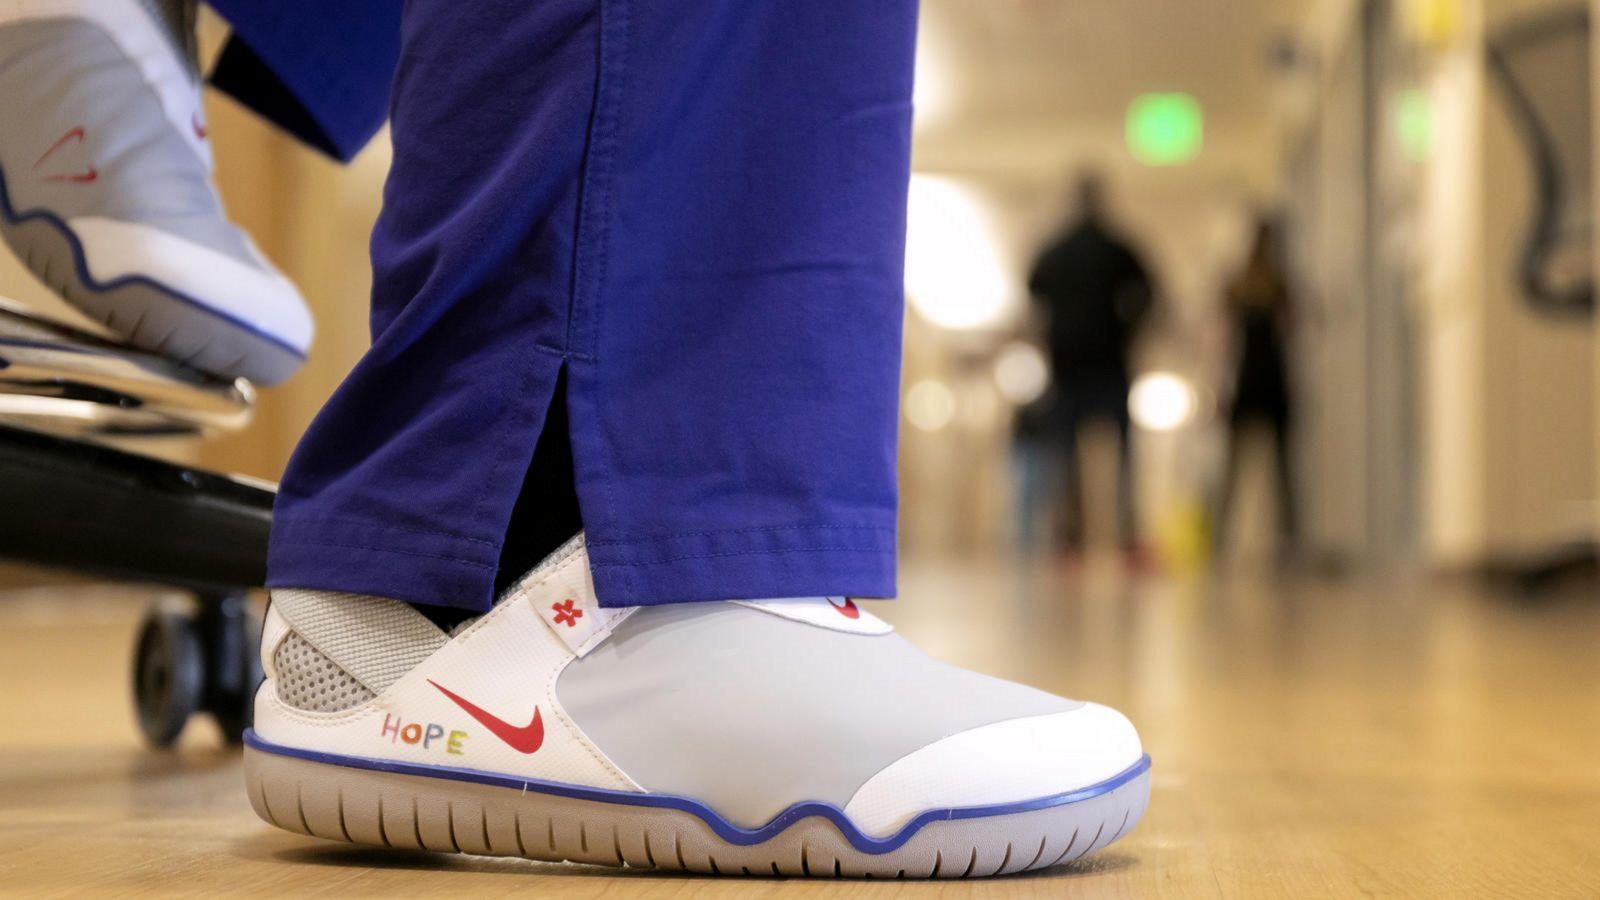 Nike donates 30,000 Air Zoom Pulse